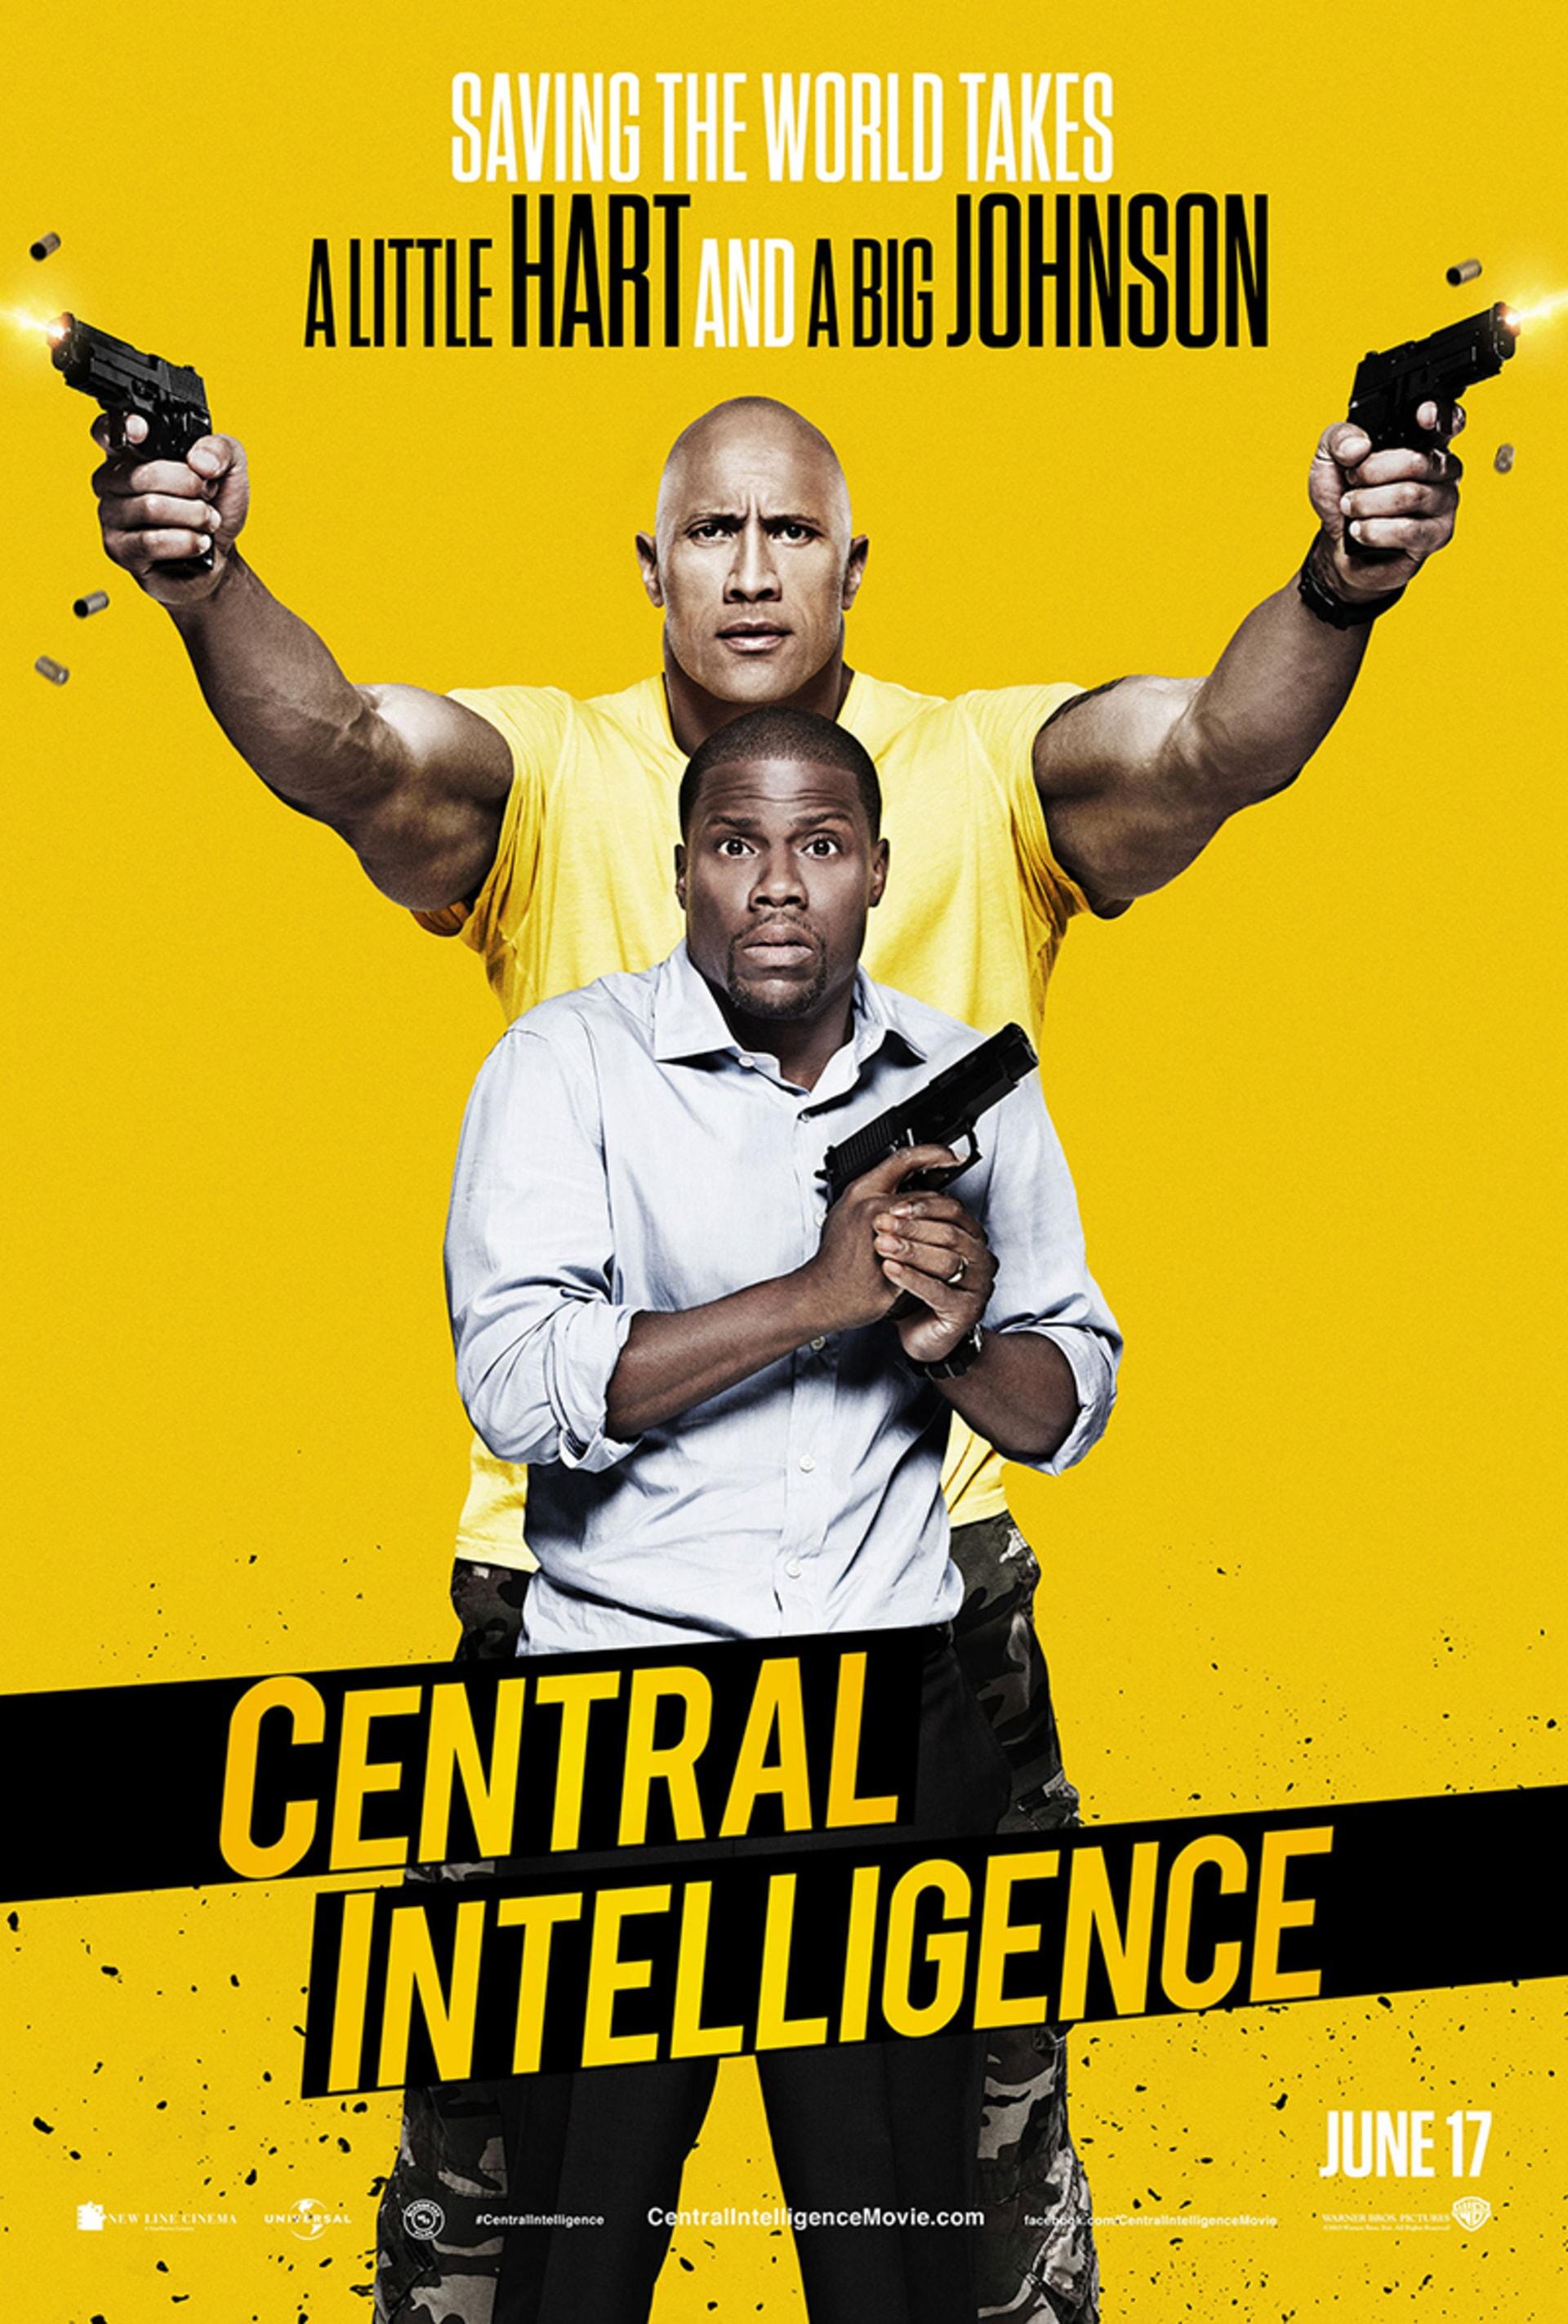 Central Intelligence - Poster 1